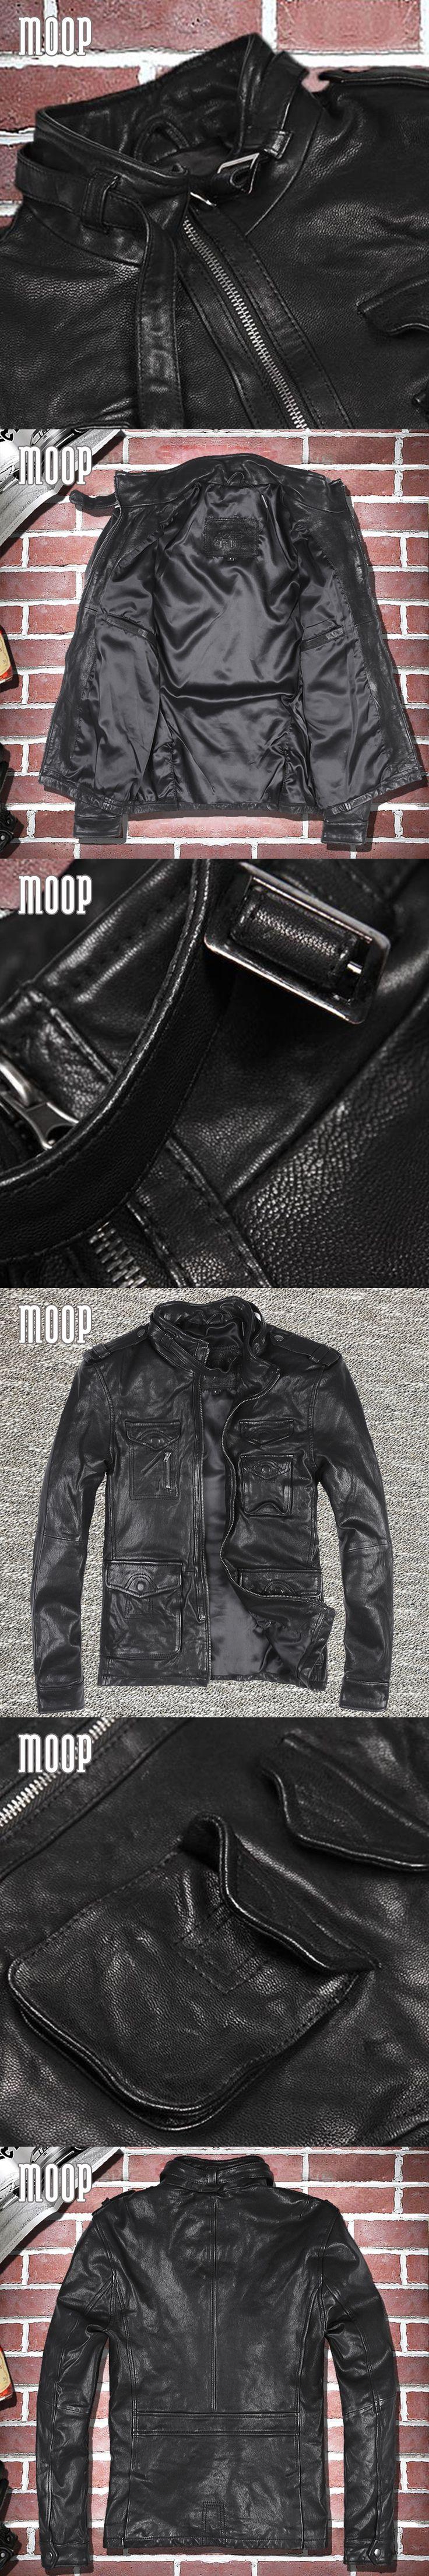 Black genuine leather jacket coat men sheepskin motorcycle jackets chaqueta moto hombre veste cuir homme cappotto LT1080